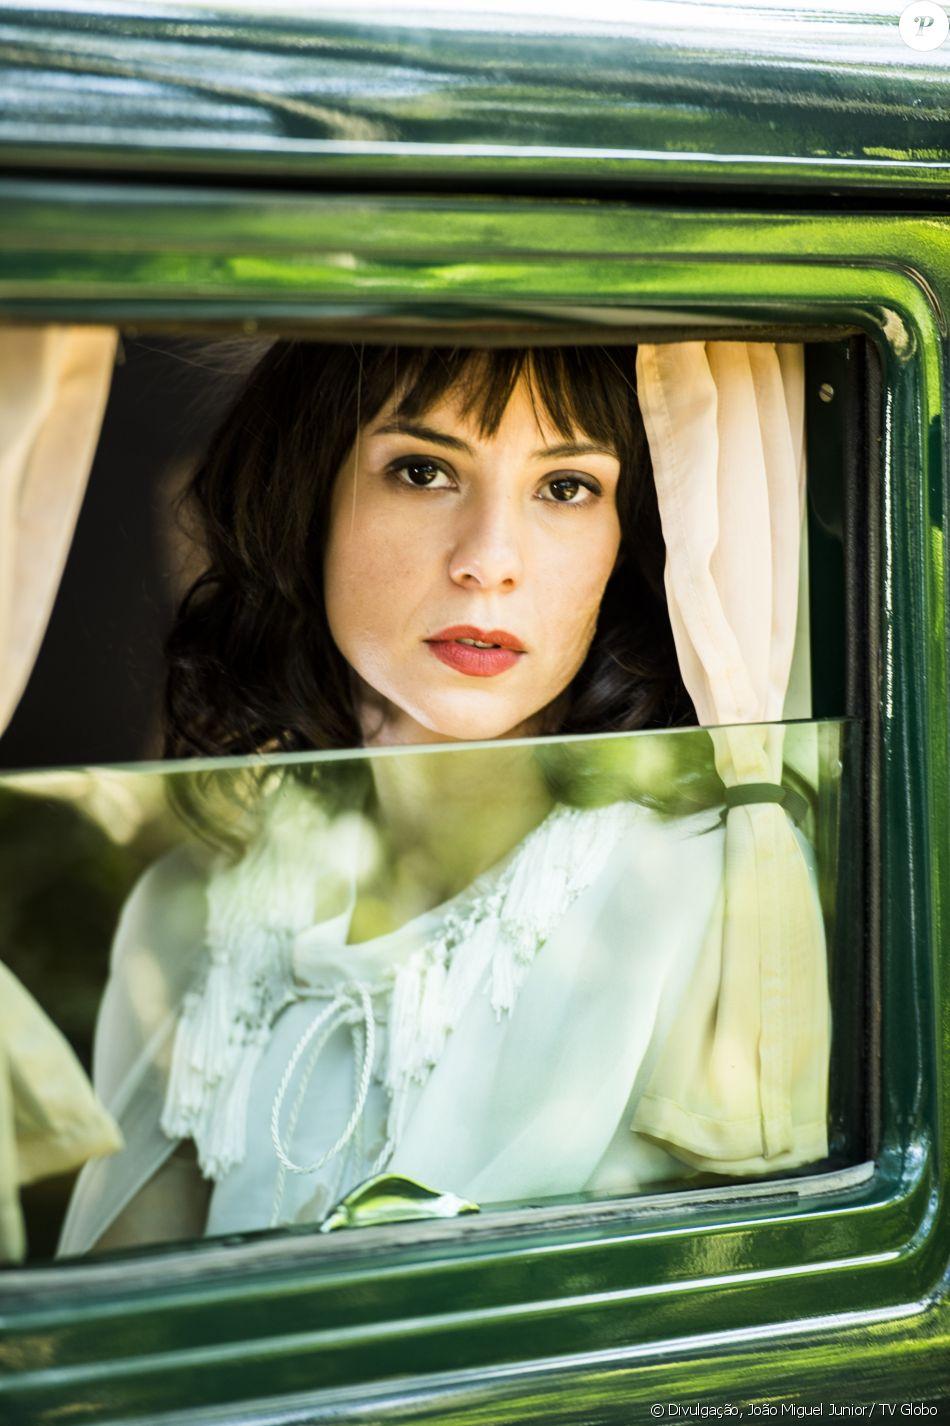 Andreia Horta vive Lucinda, antagonista complexada, na novela 'Tempo de Amar', que estreia em 26 de setembro de 2017